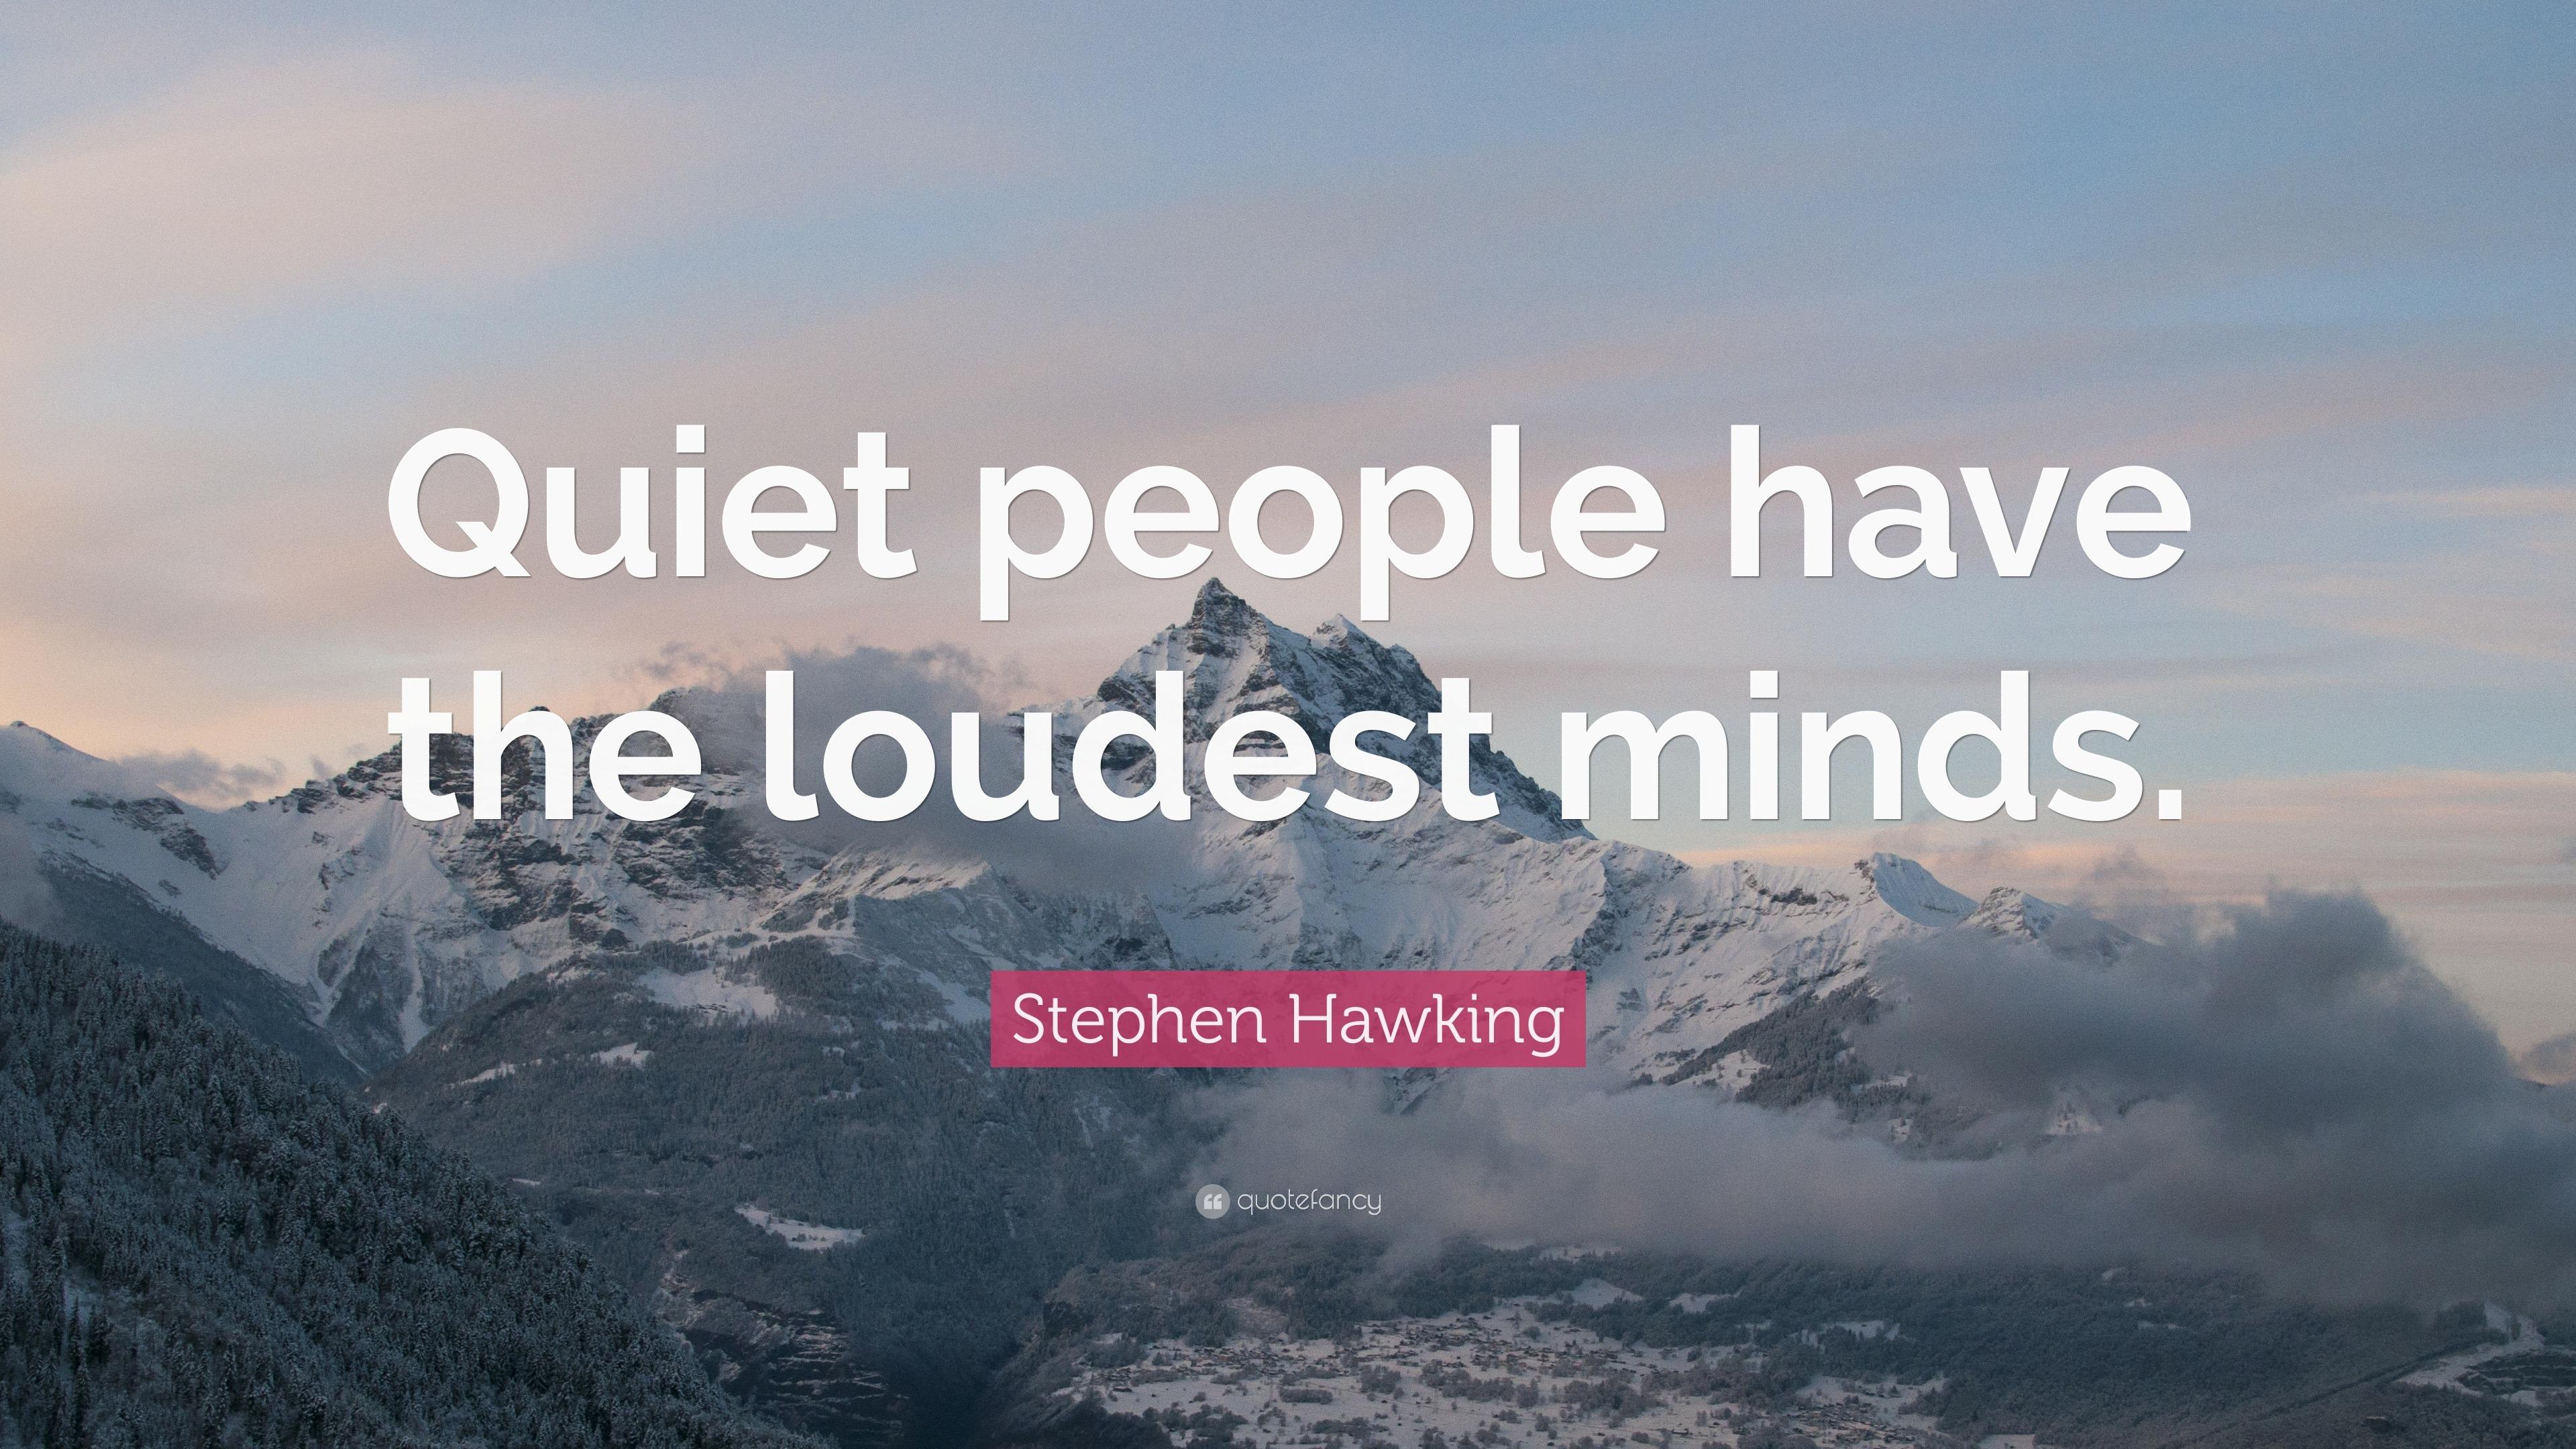 Stephen hawking quotes quiet people